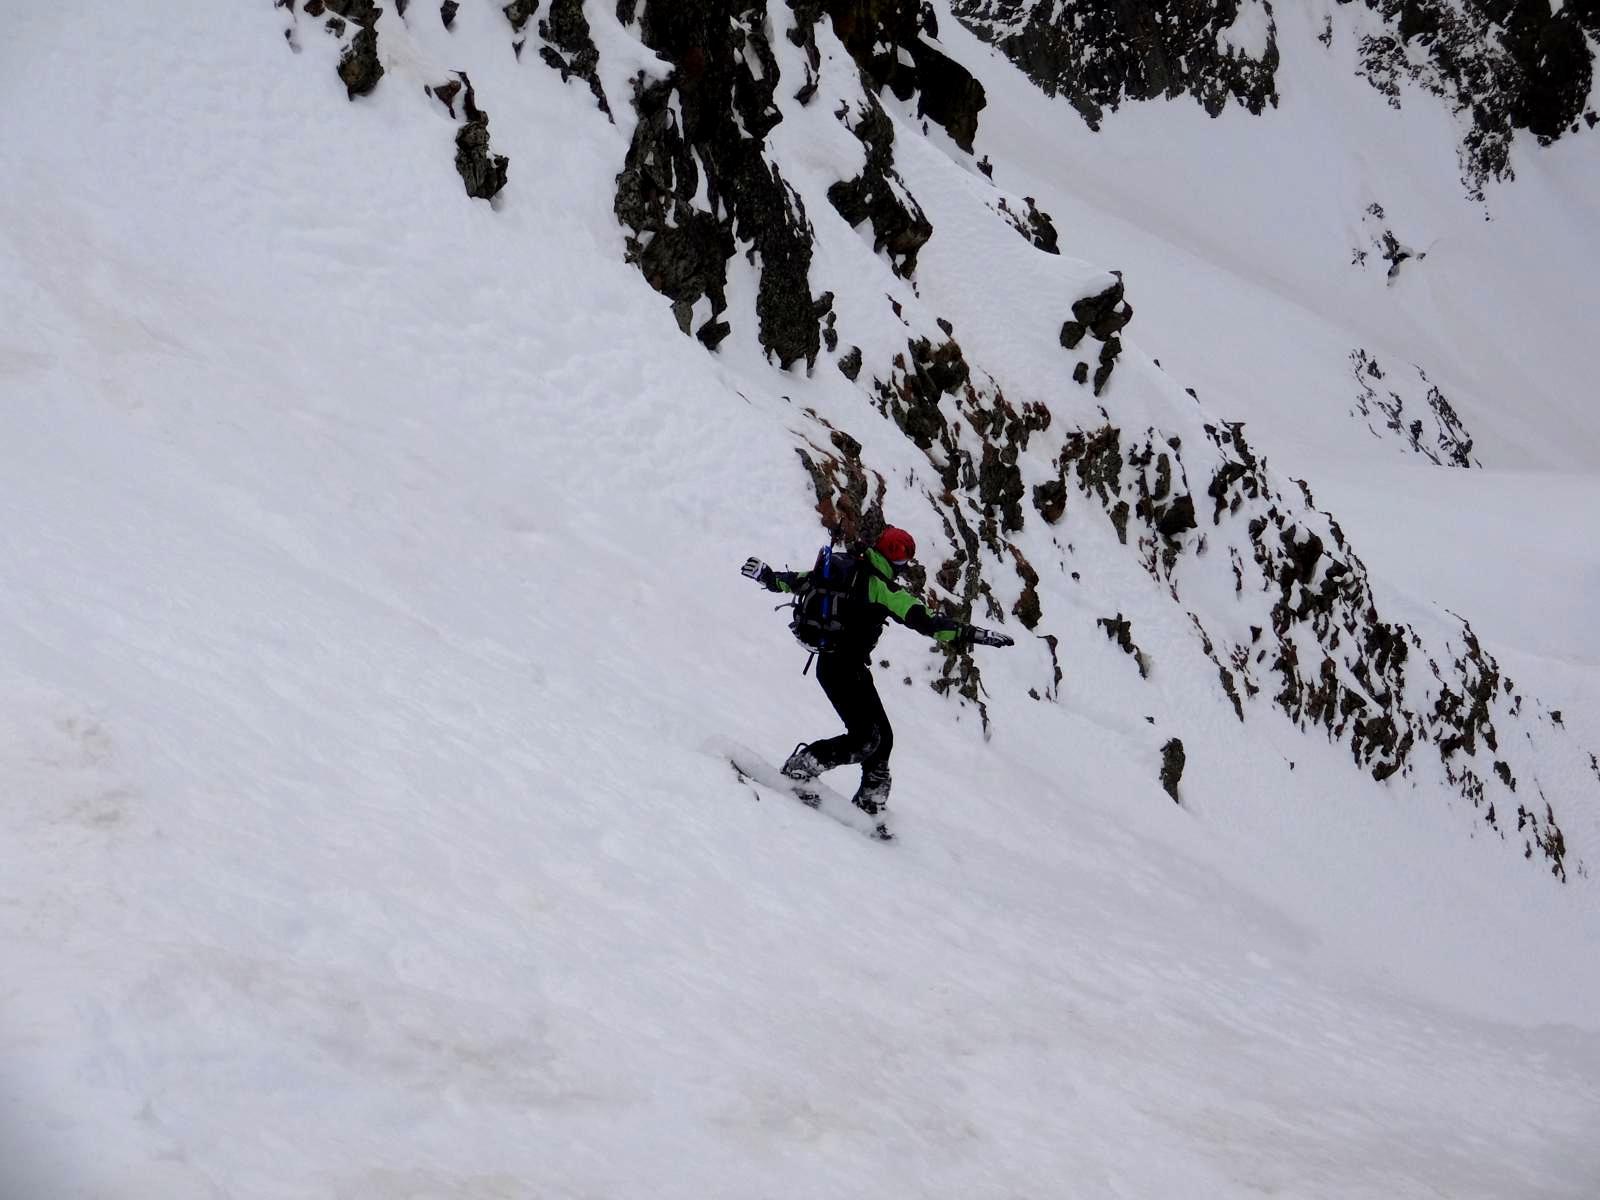 parete Sacilotto, ripida ma neve ottima